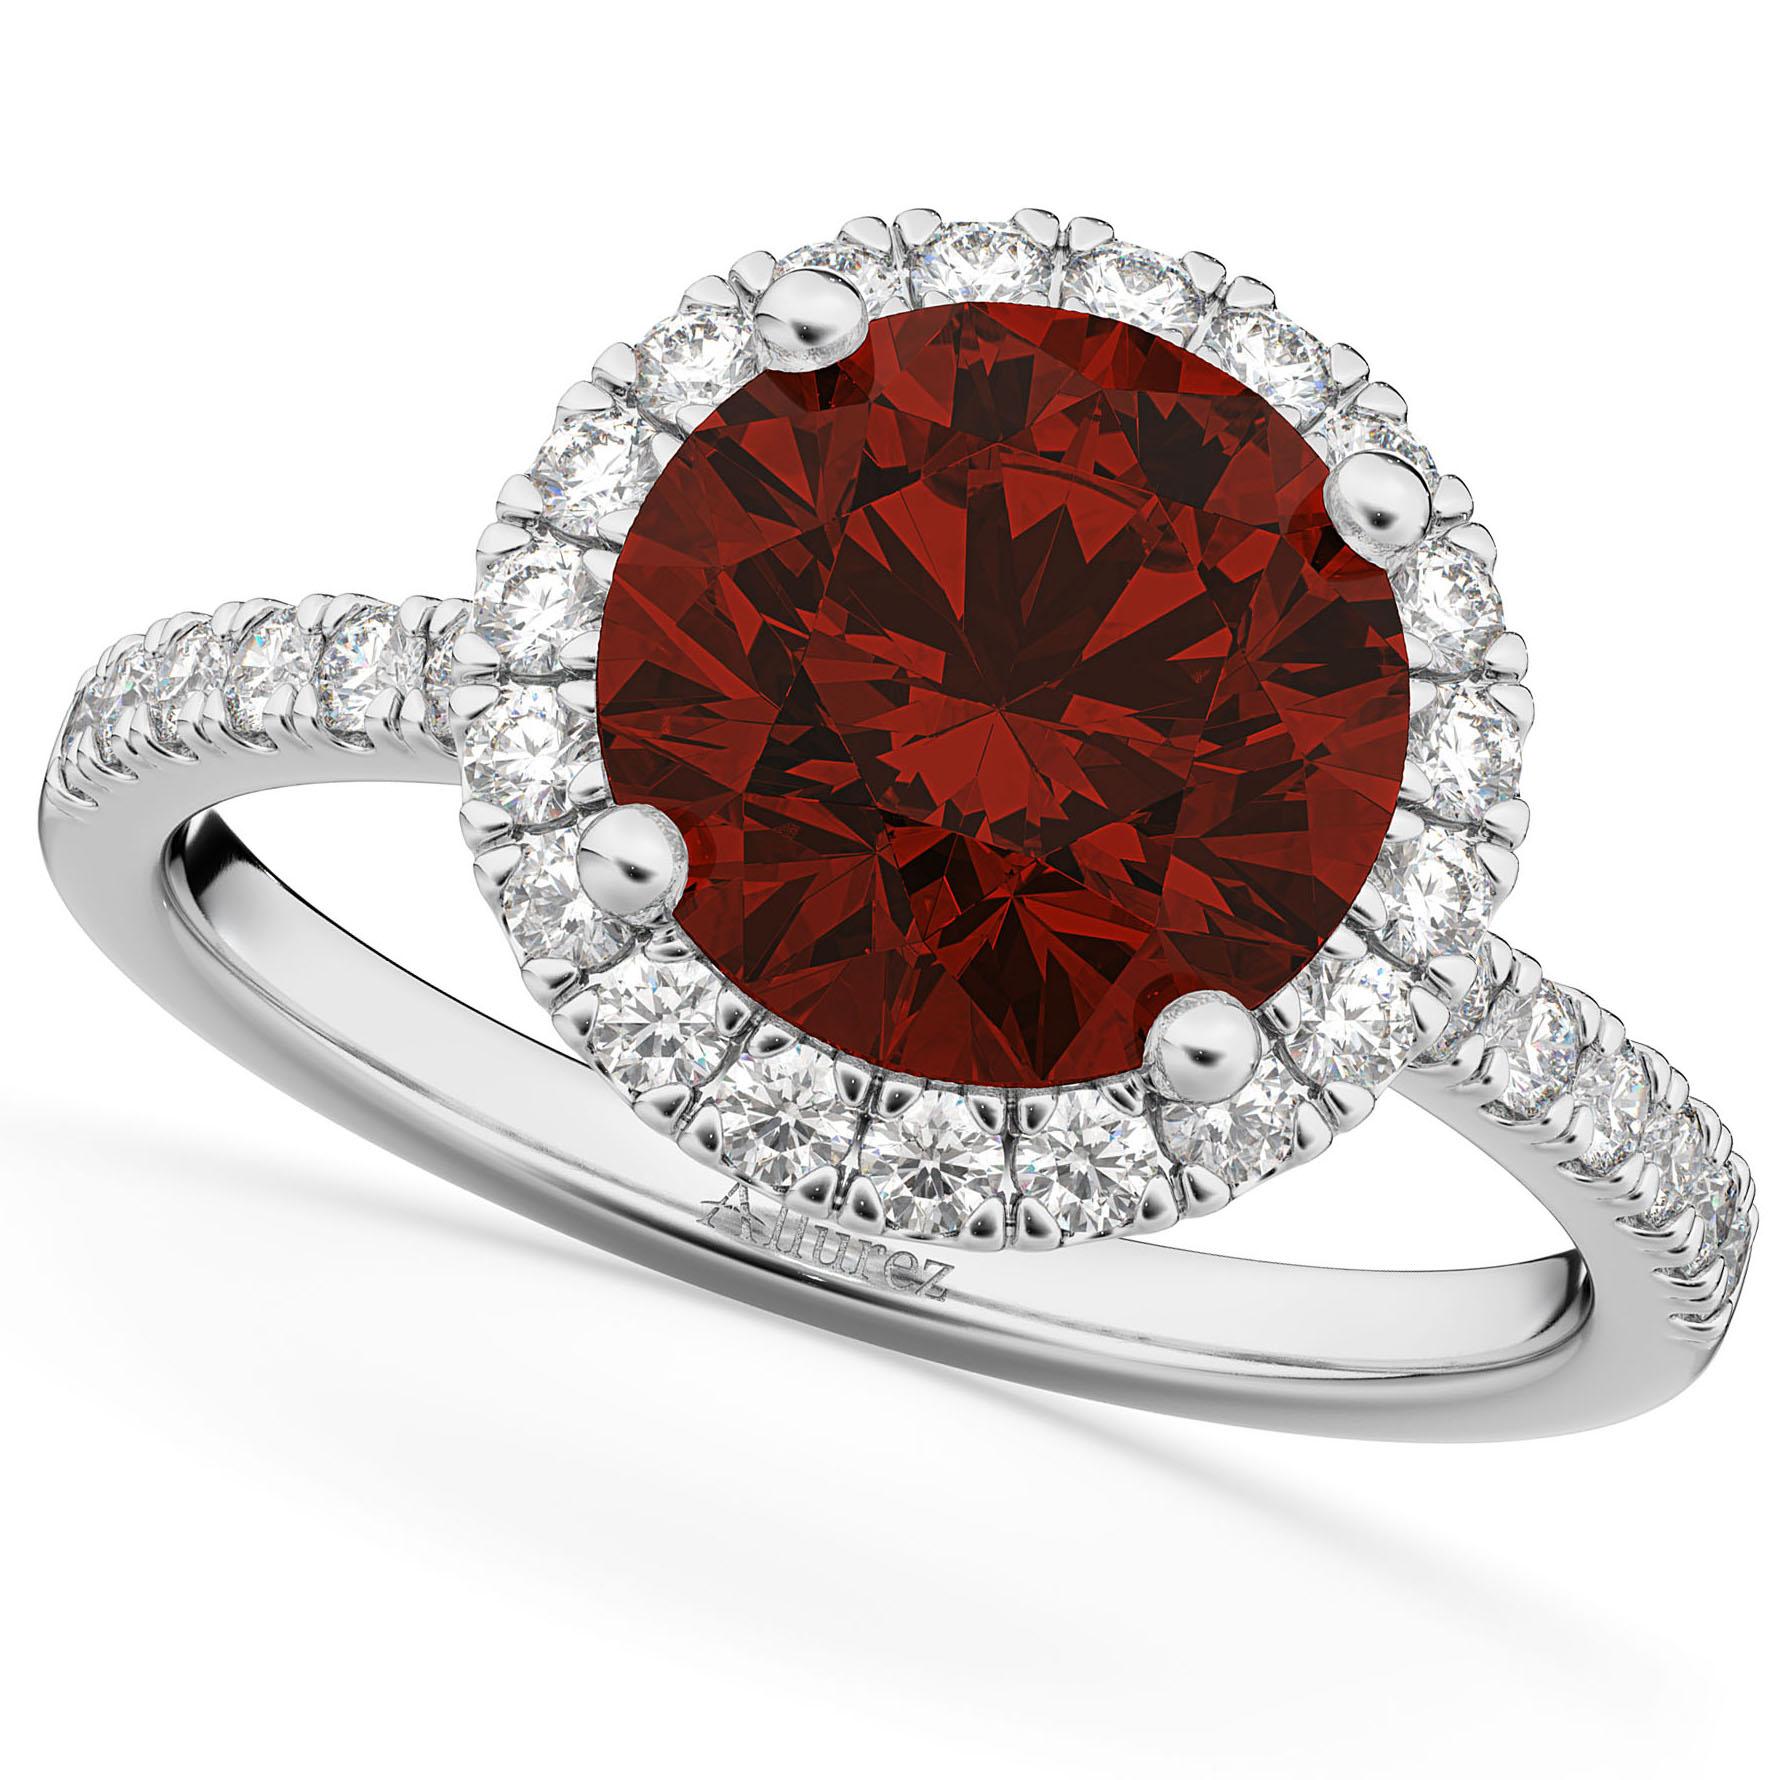 Halo Garnet & Diamond Engagement Ring 14K White Gold 3.00ct